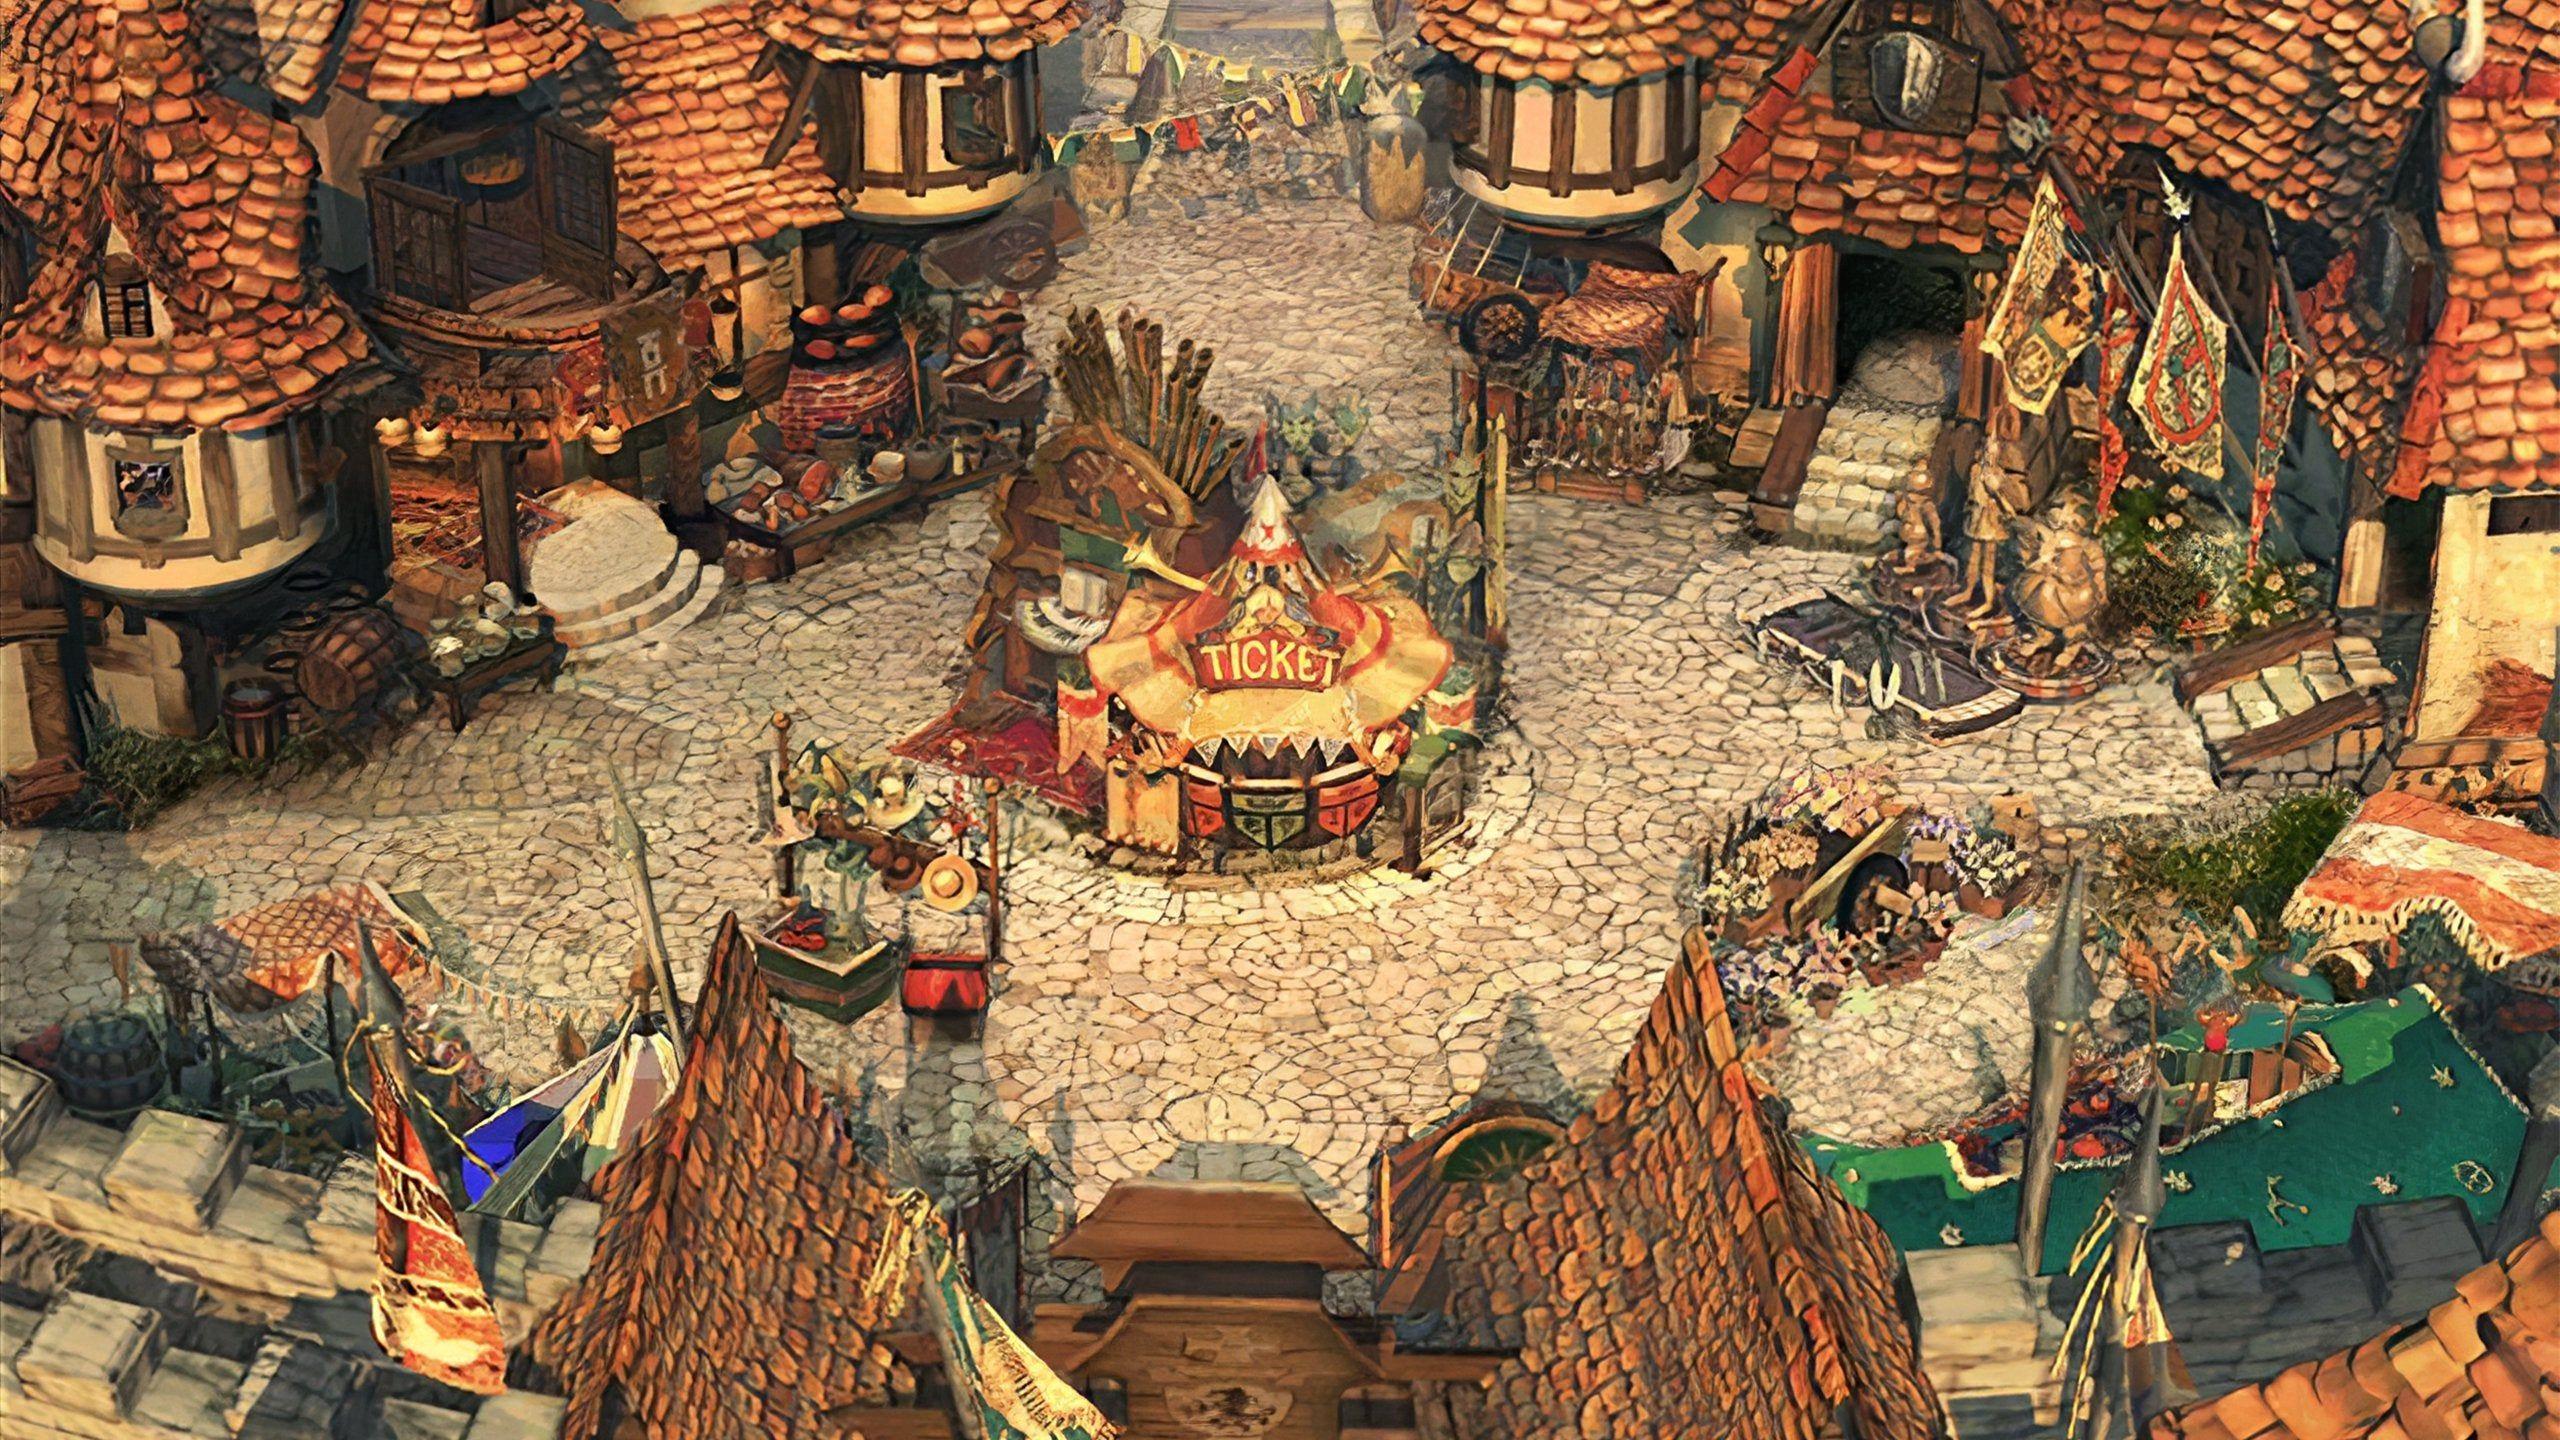 Final Fantasy Alexandria Hd Wallpaper Fantasy Concept Art Final Fantasy Ix Fantasy Town